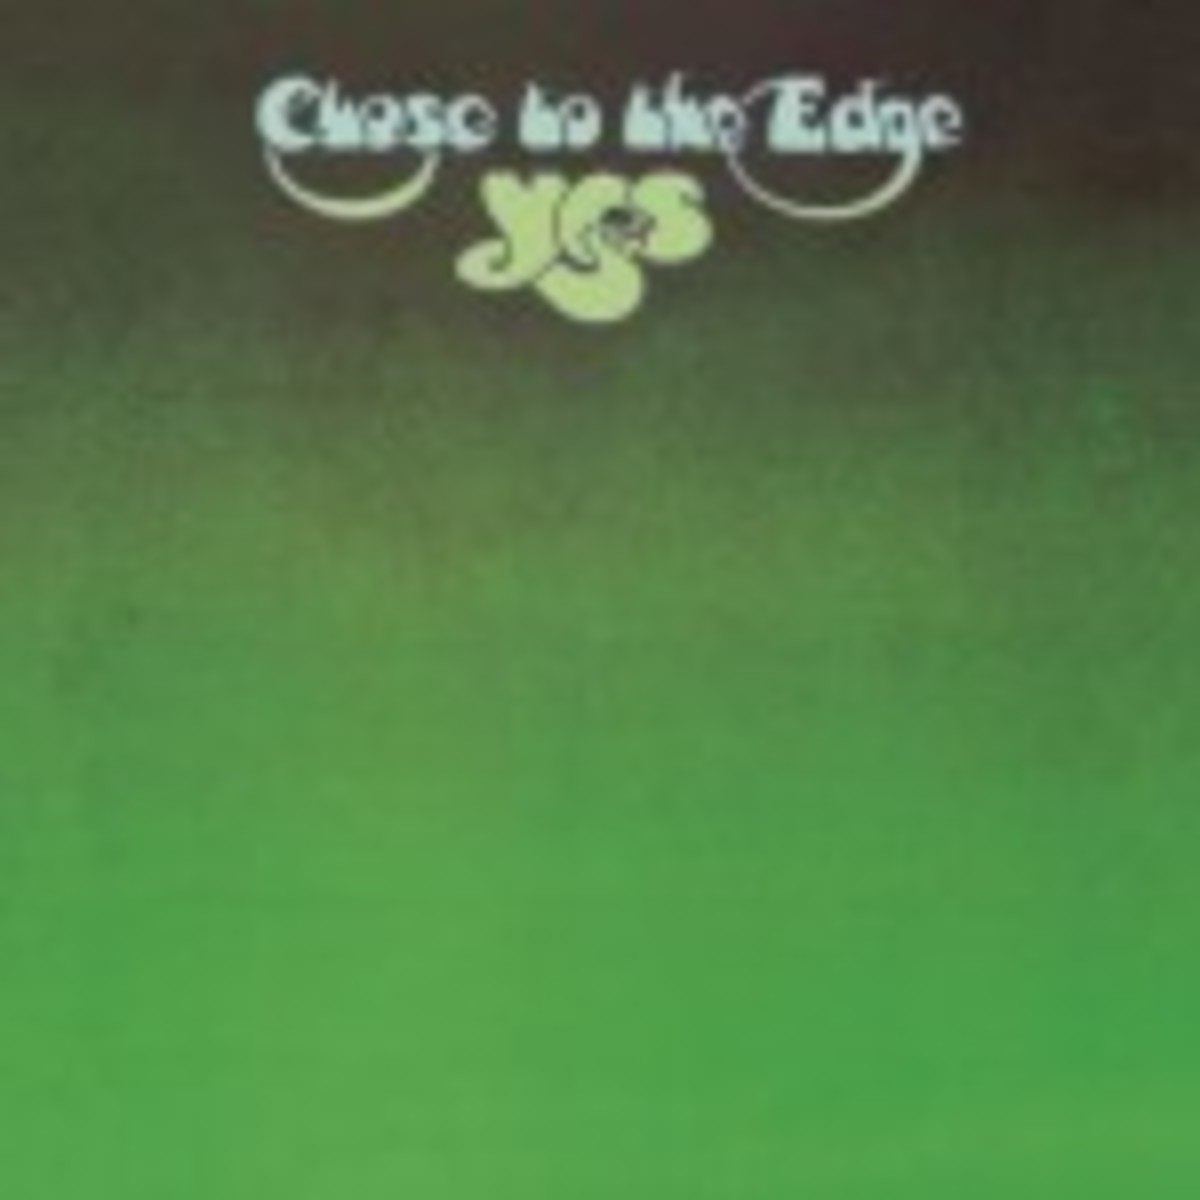 Yes_CloseToTheEdge